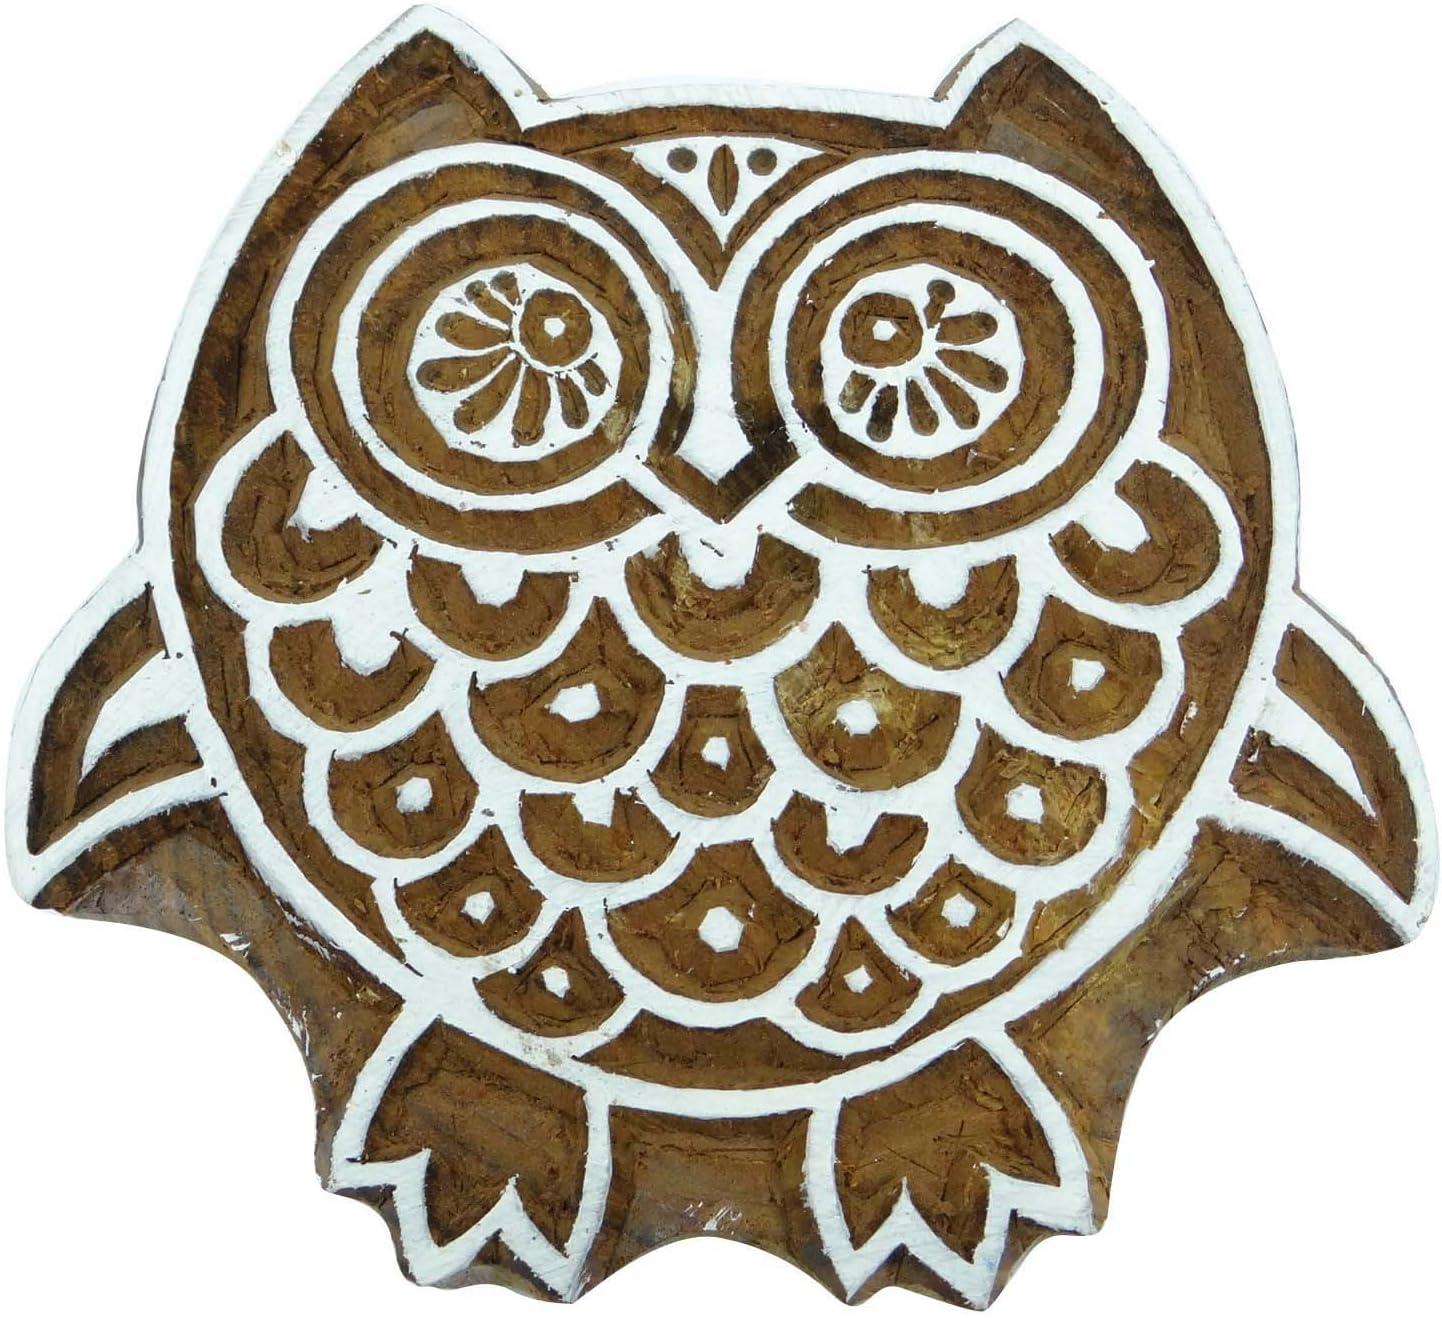 Scrapbook Stamp Decorative Blocks Wooden Textile Stamps Owl Printing Block